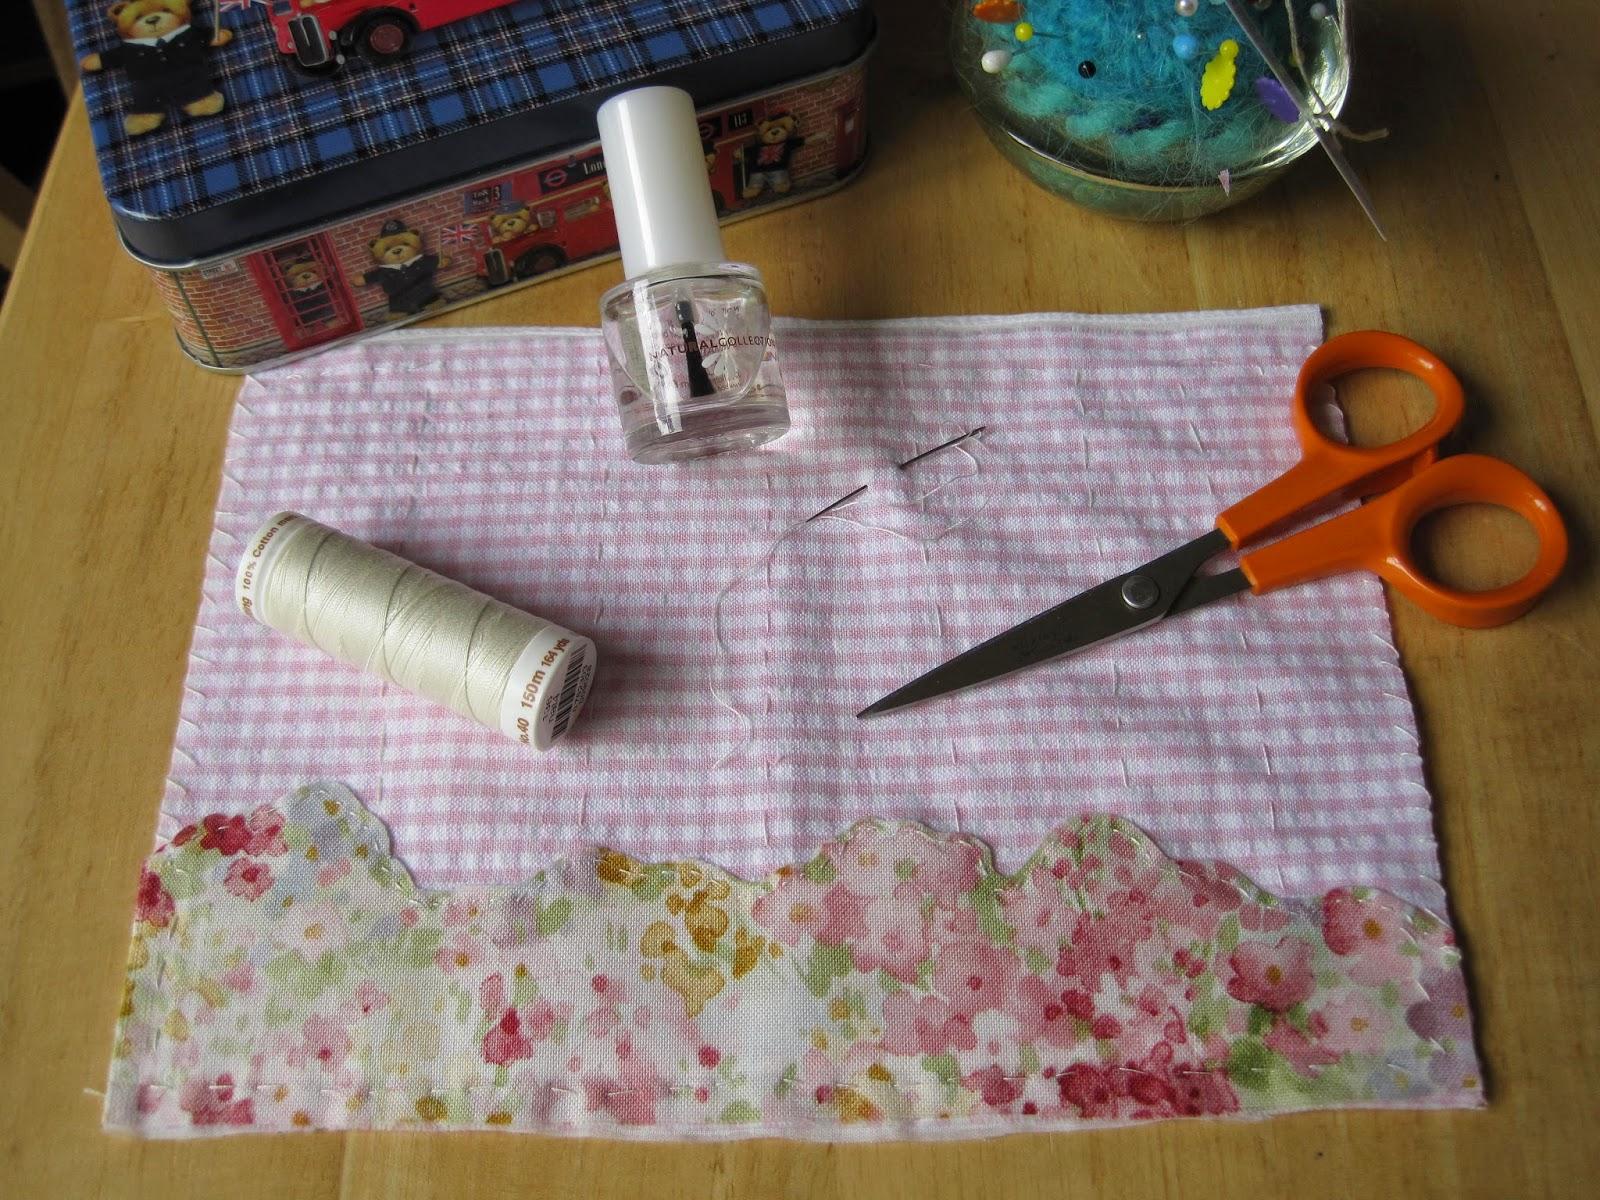 Needle-case tutorial